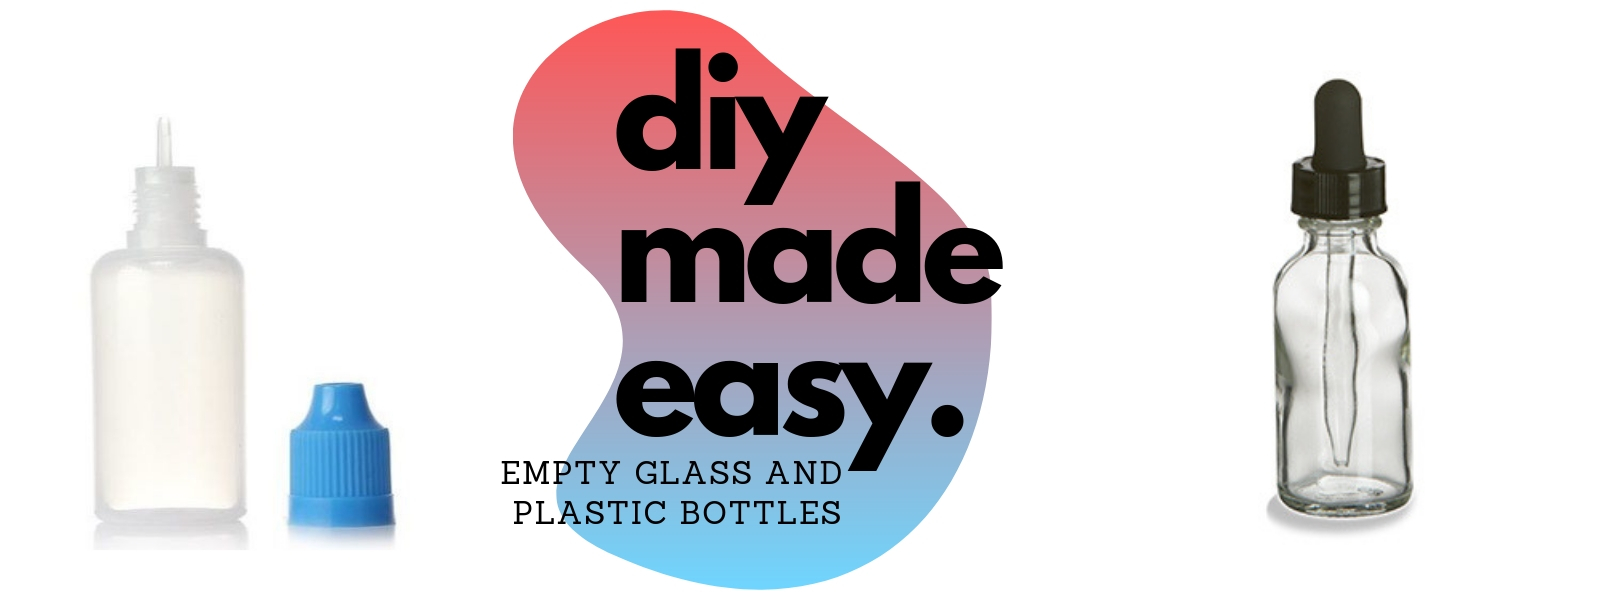 Vape Juice Bottles | Empty Bottles for Ejuice - Central Vapors